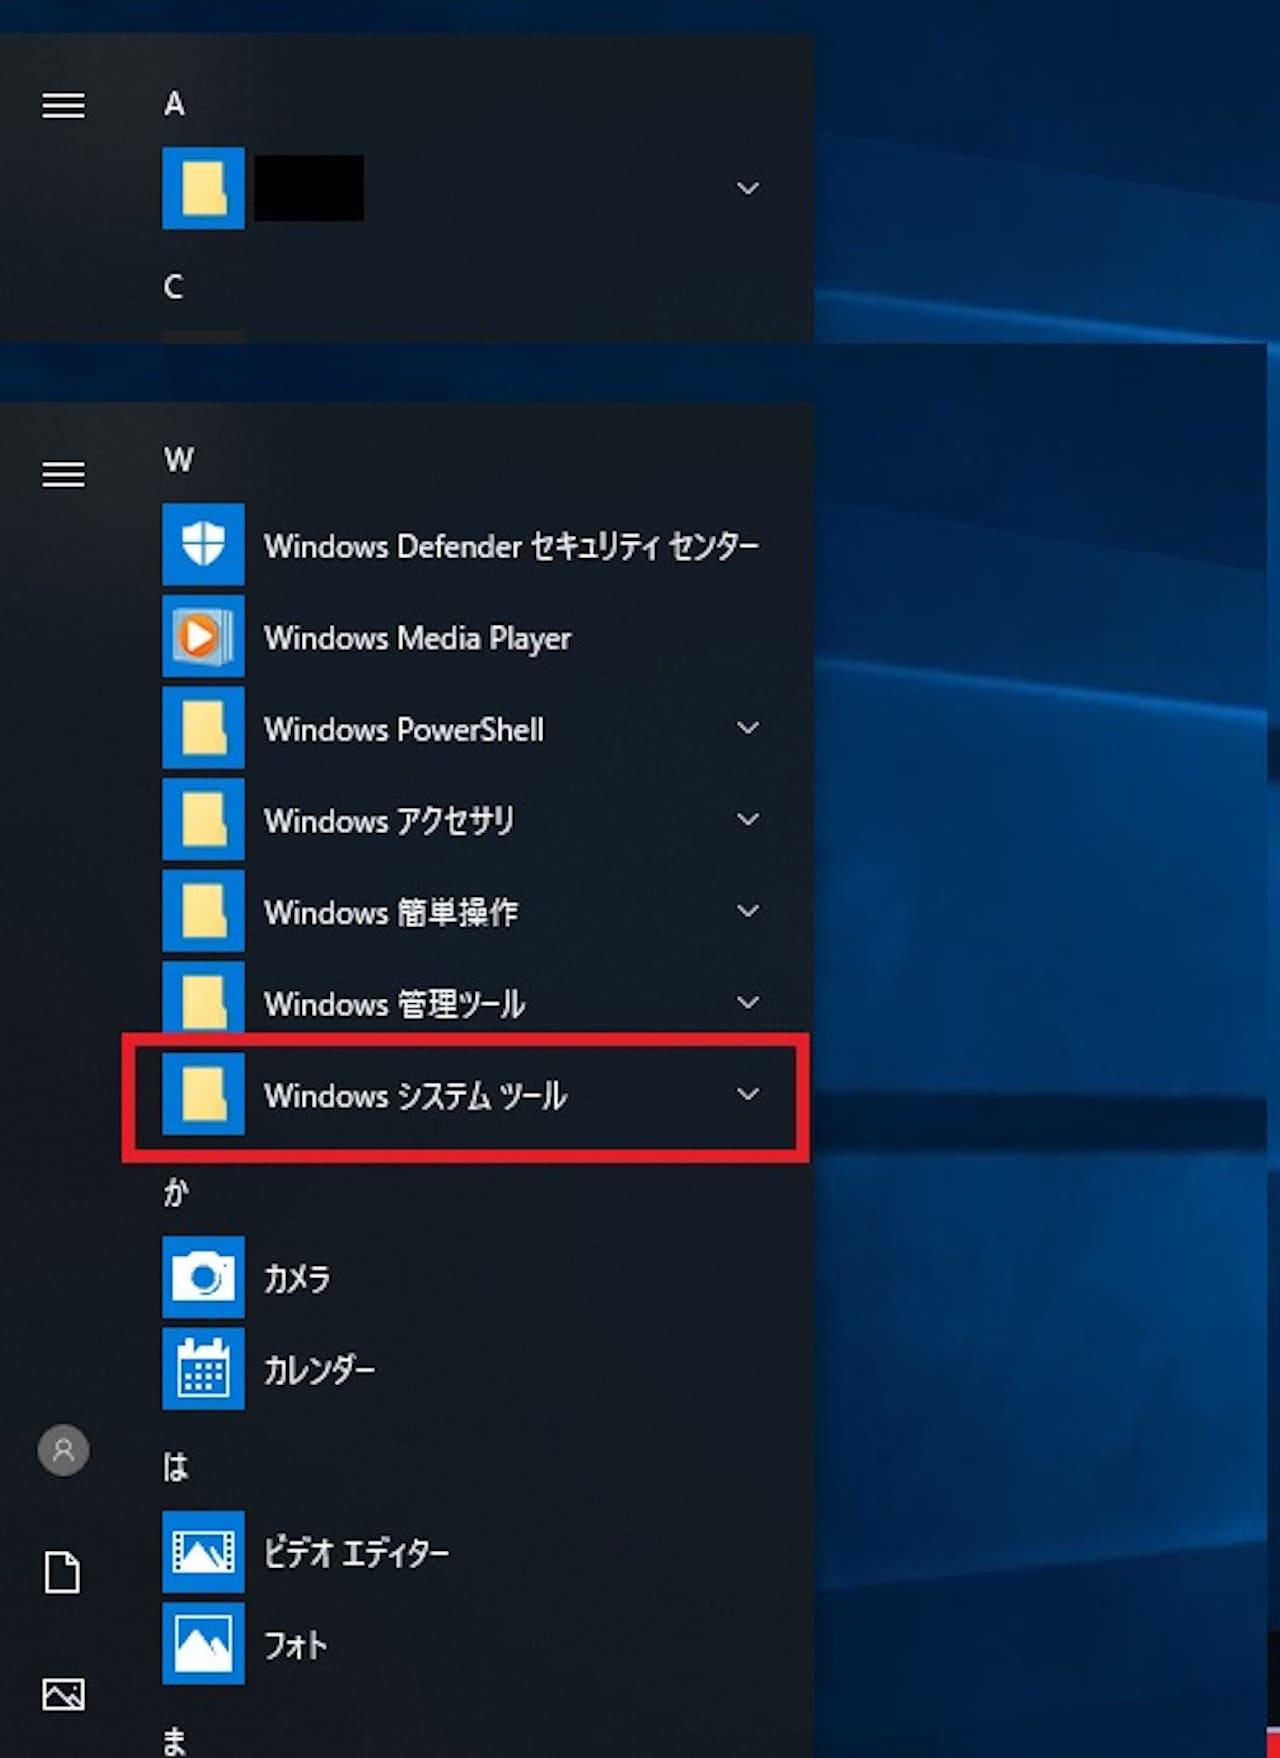 Windowsシステムツールからコントロールパネルを開く方法③